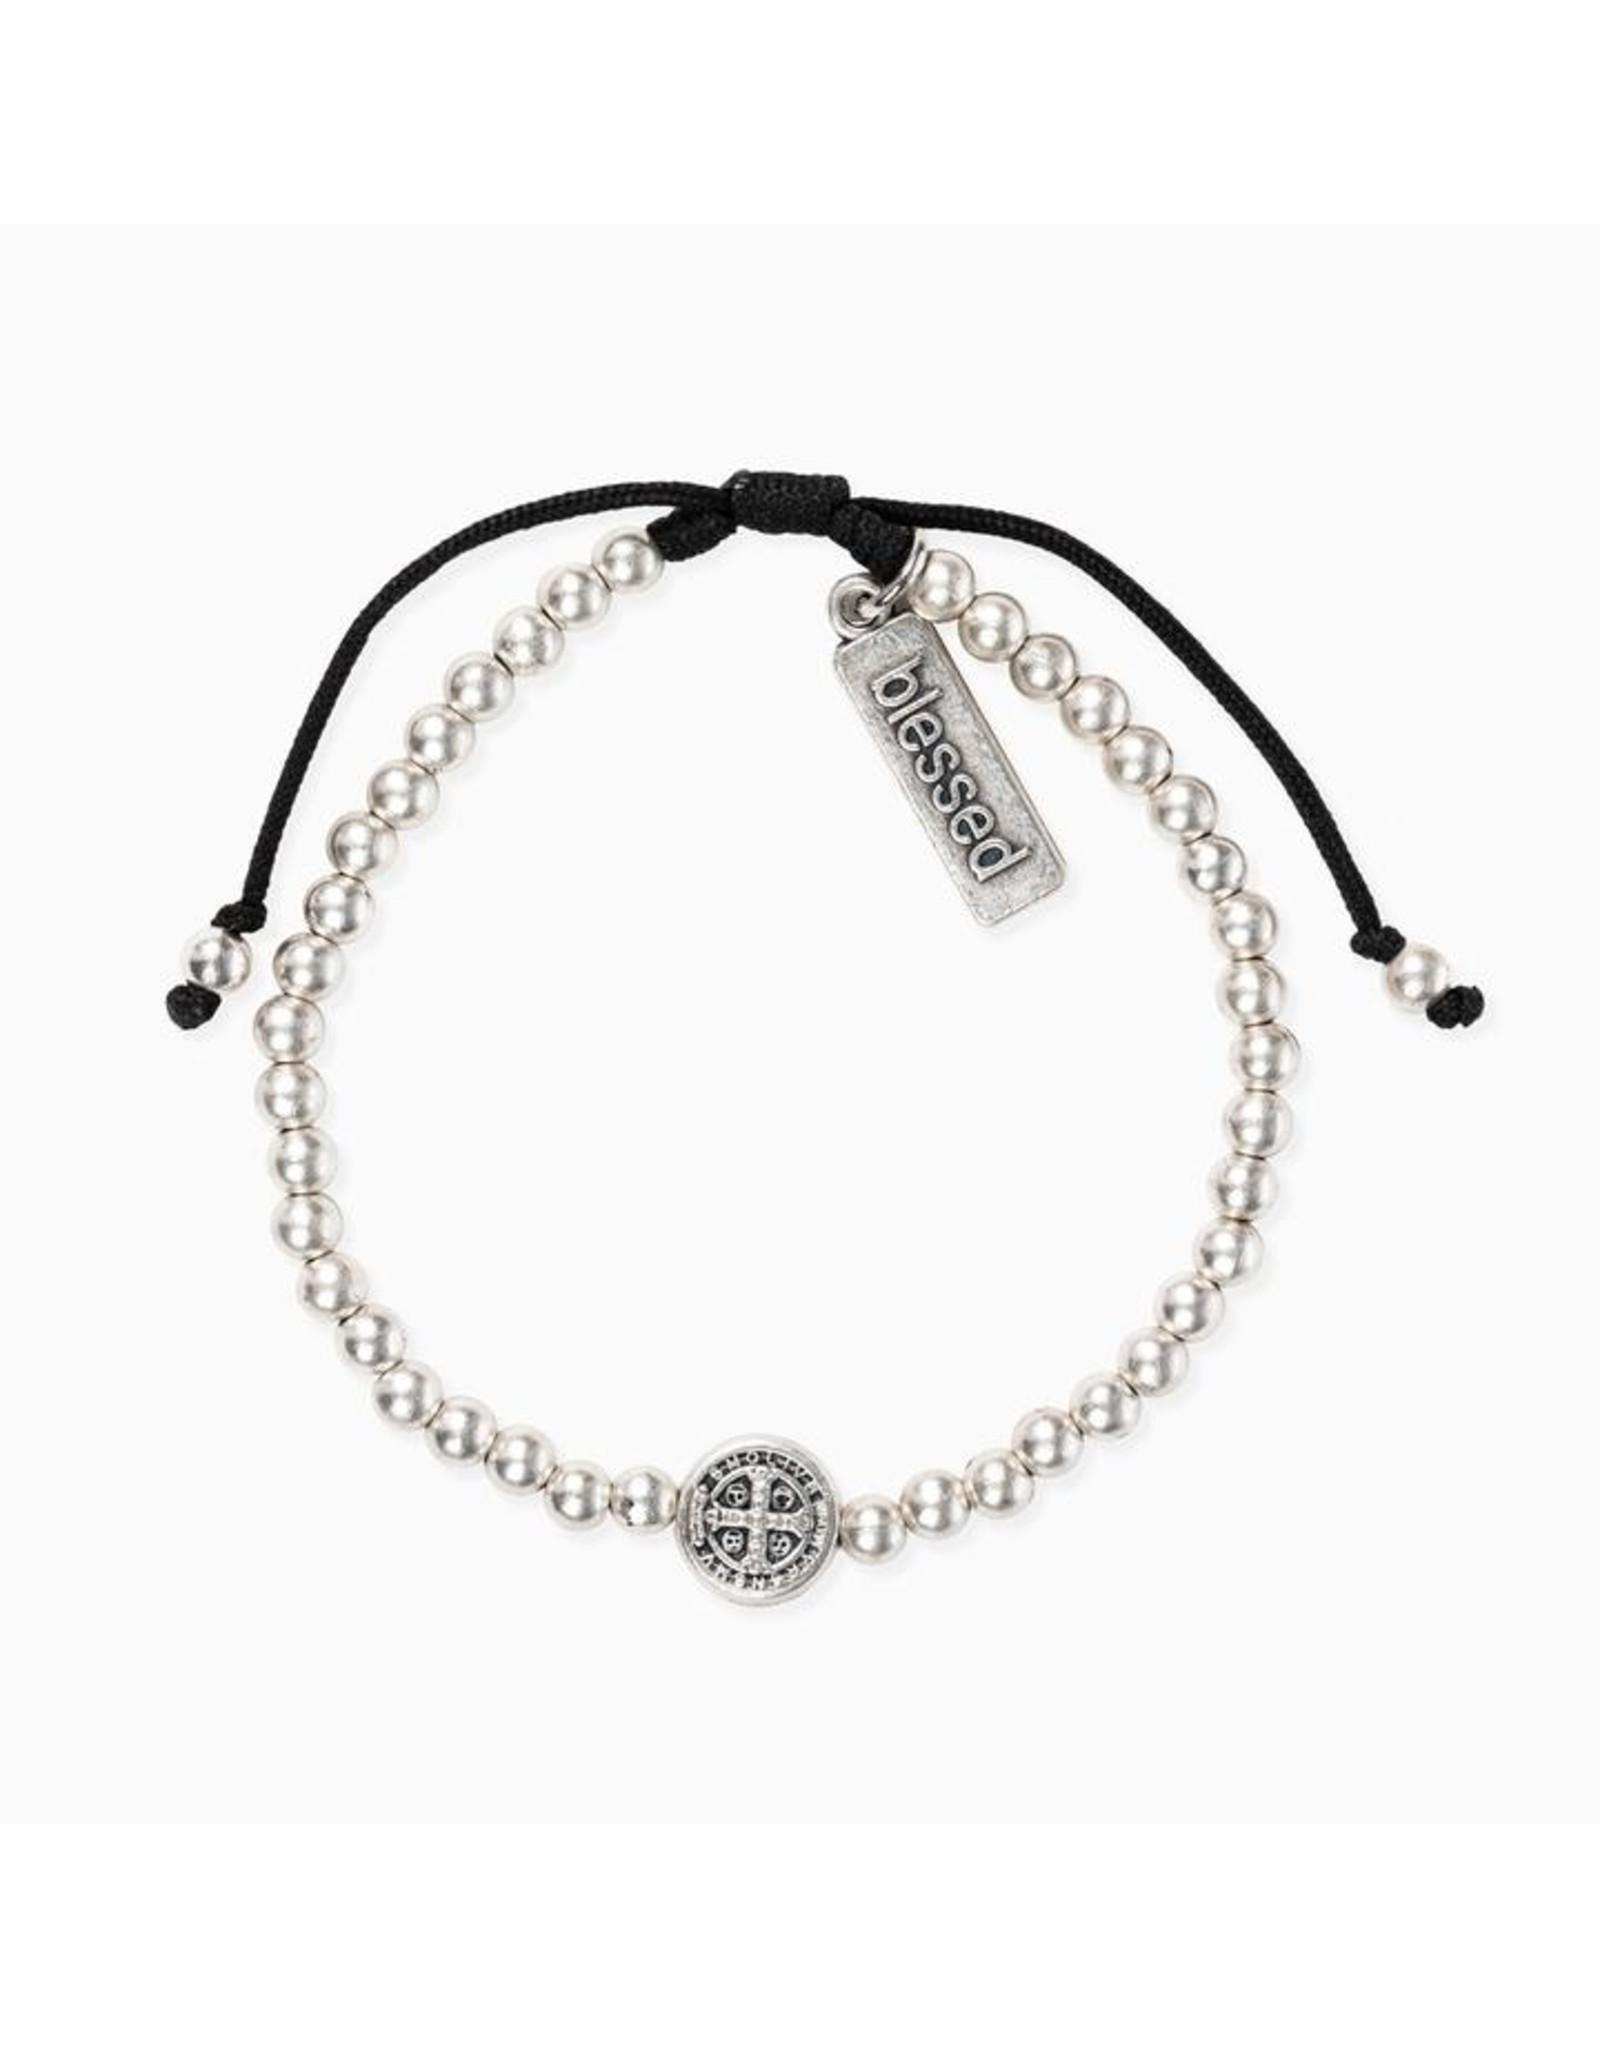 MSMH Mantra Of Love Bracelet- Silver/Black